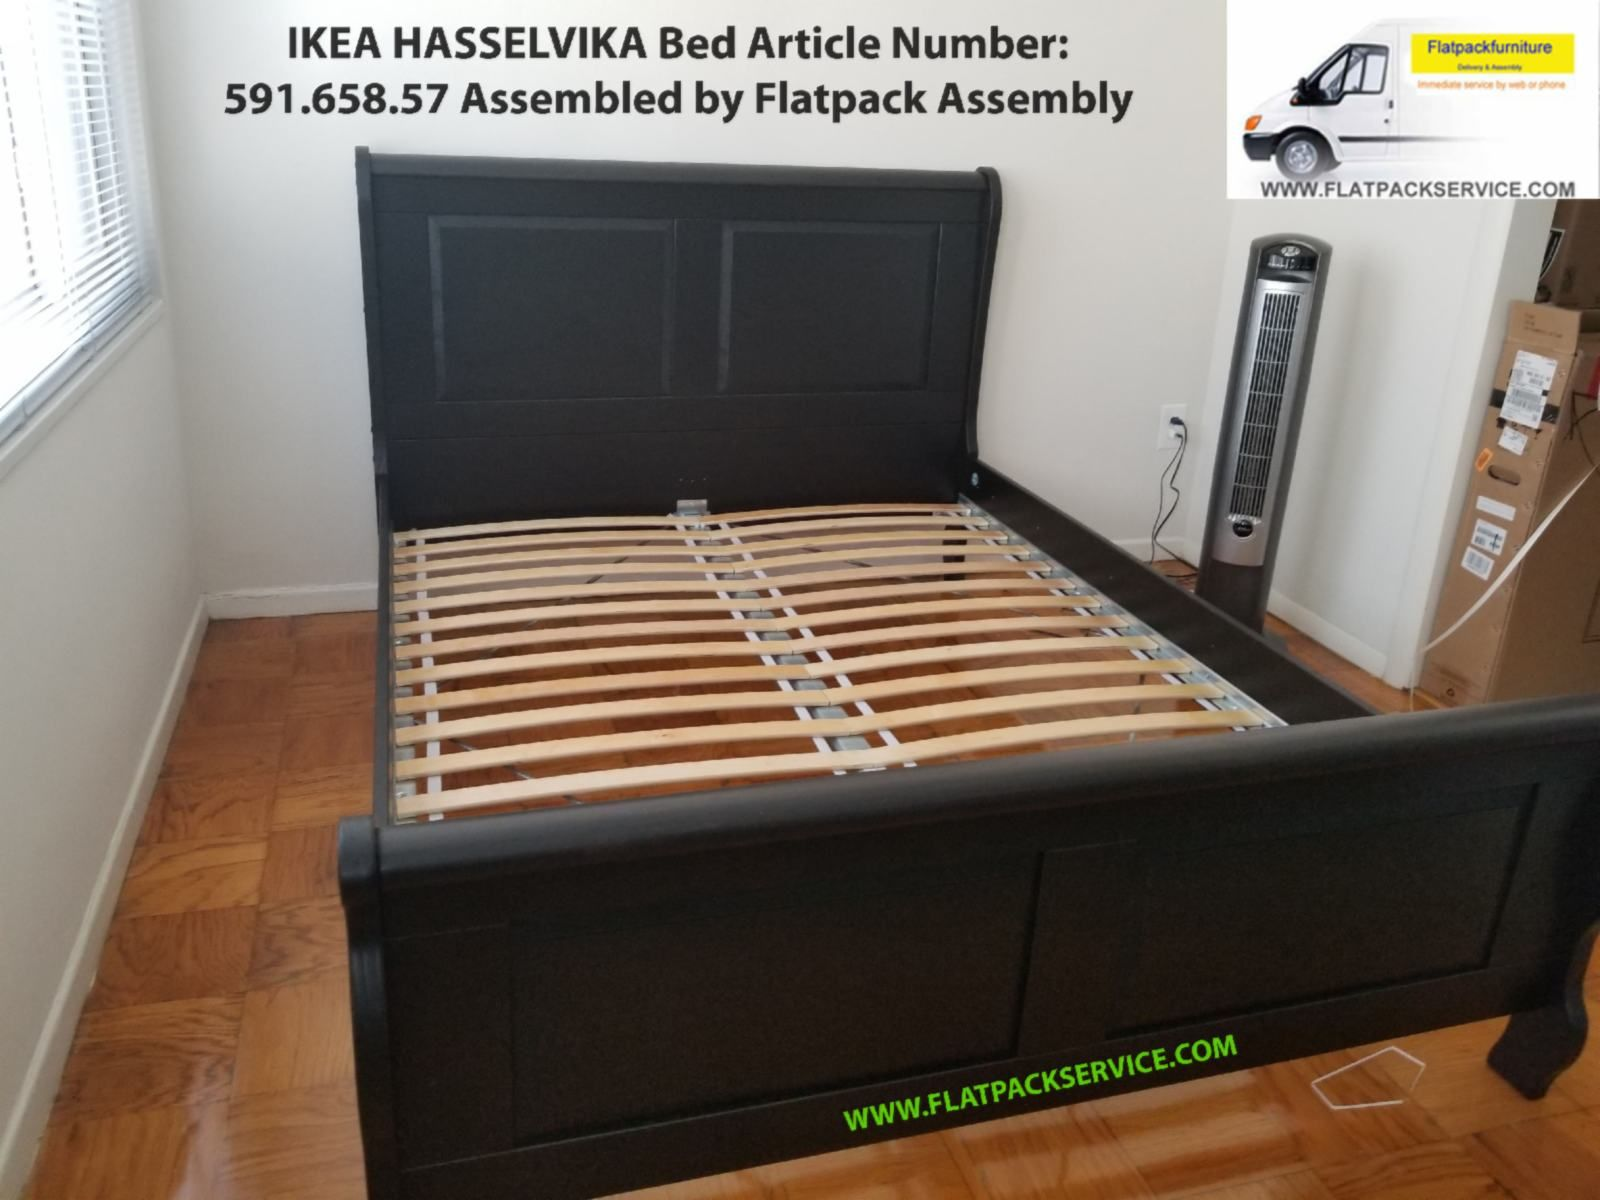 Ikea Hasselvika Bed Assembly Service In Washington Dc 202 277 5911